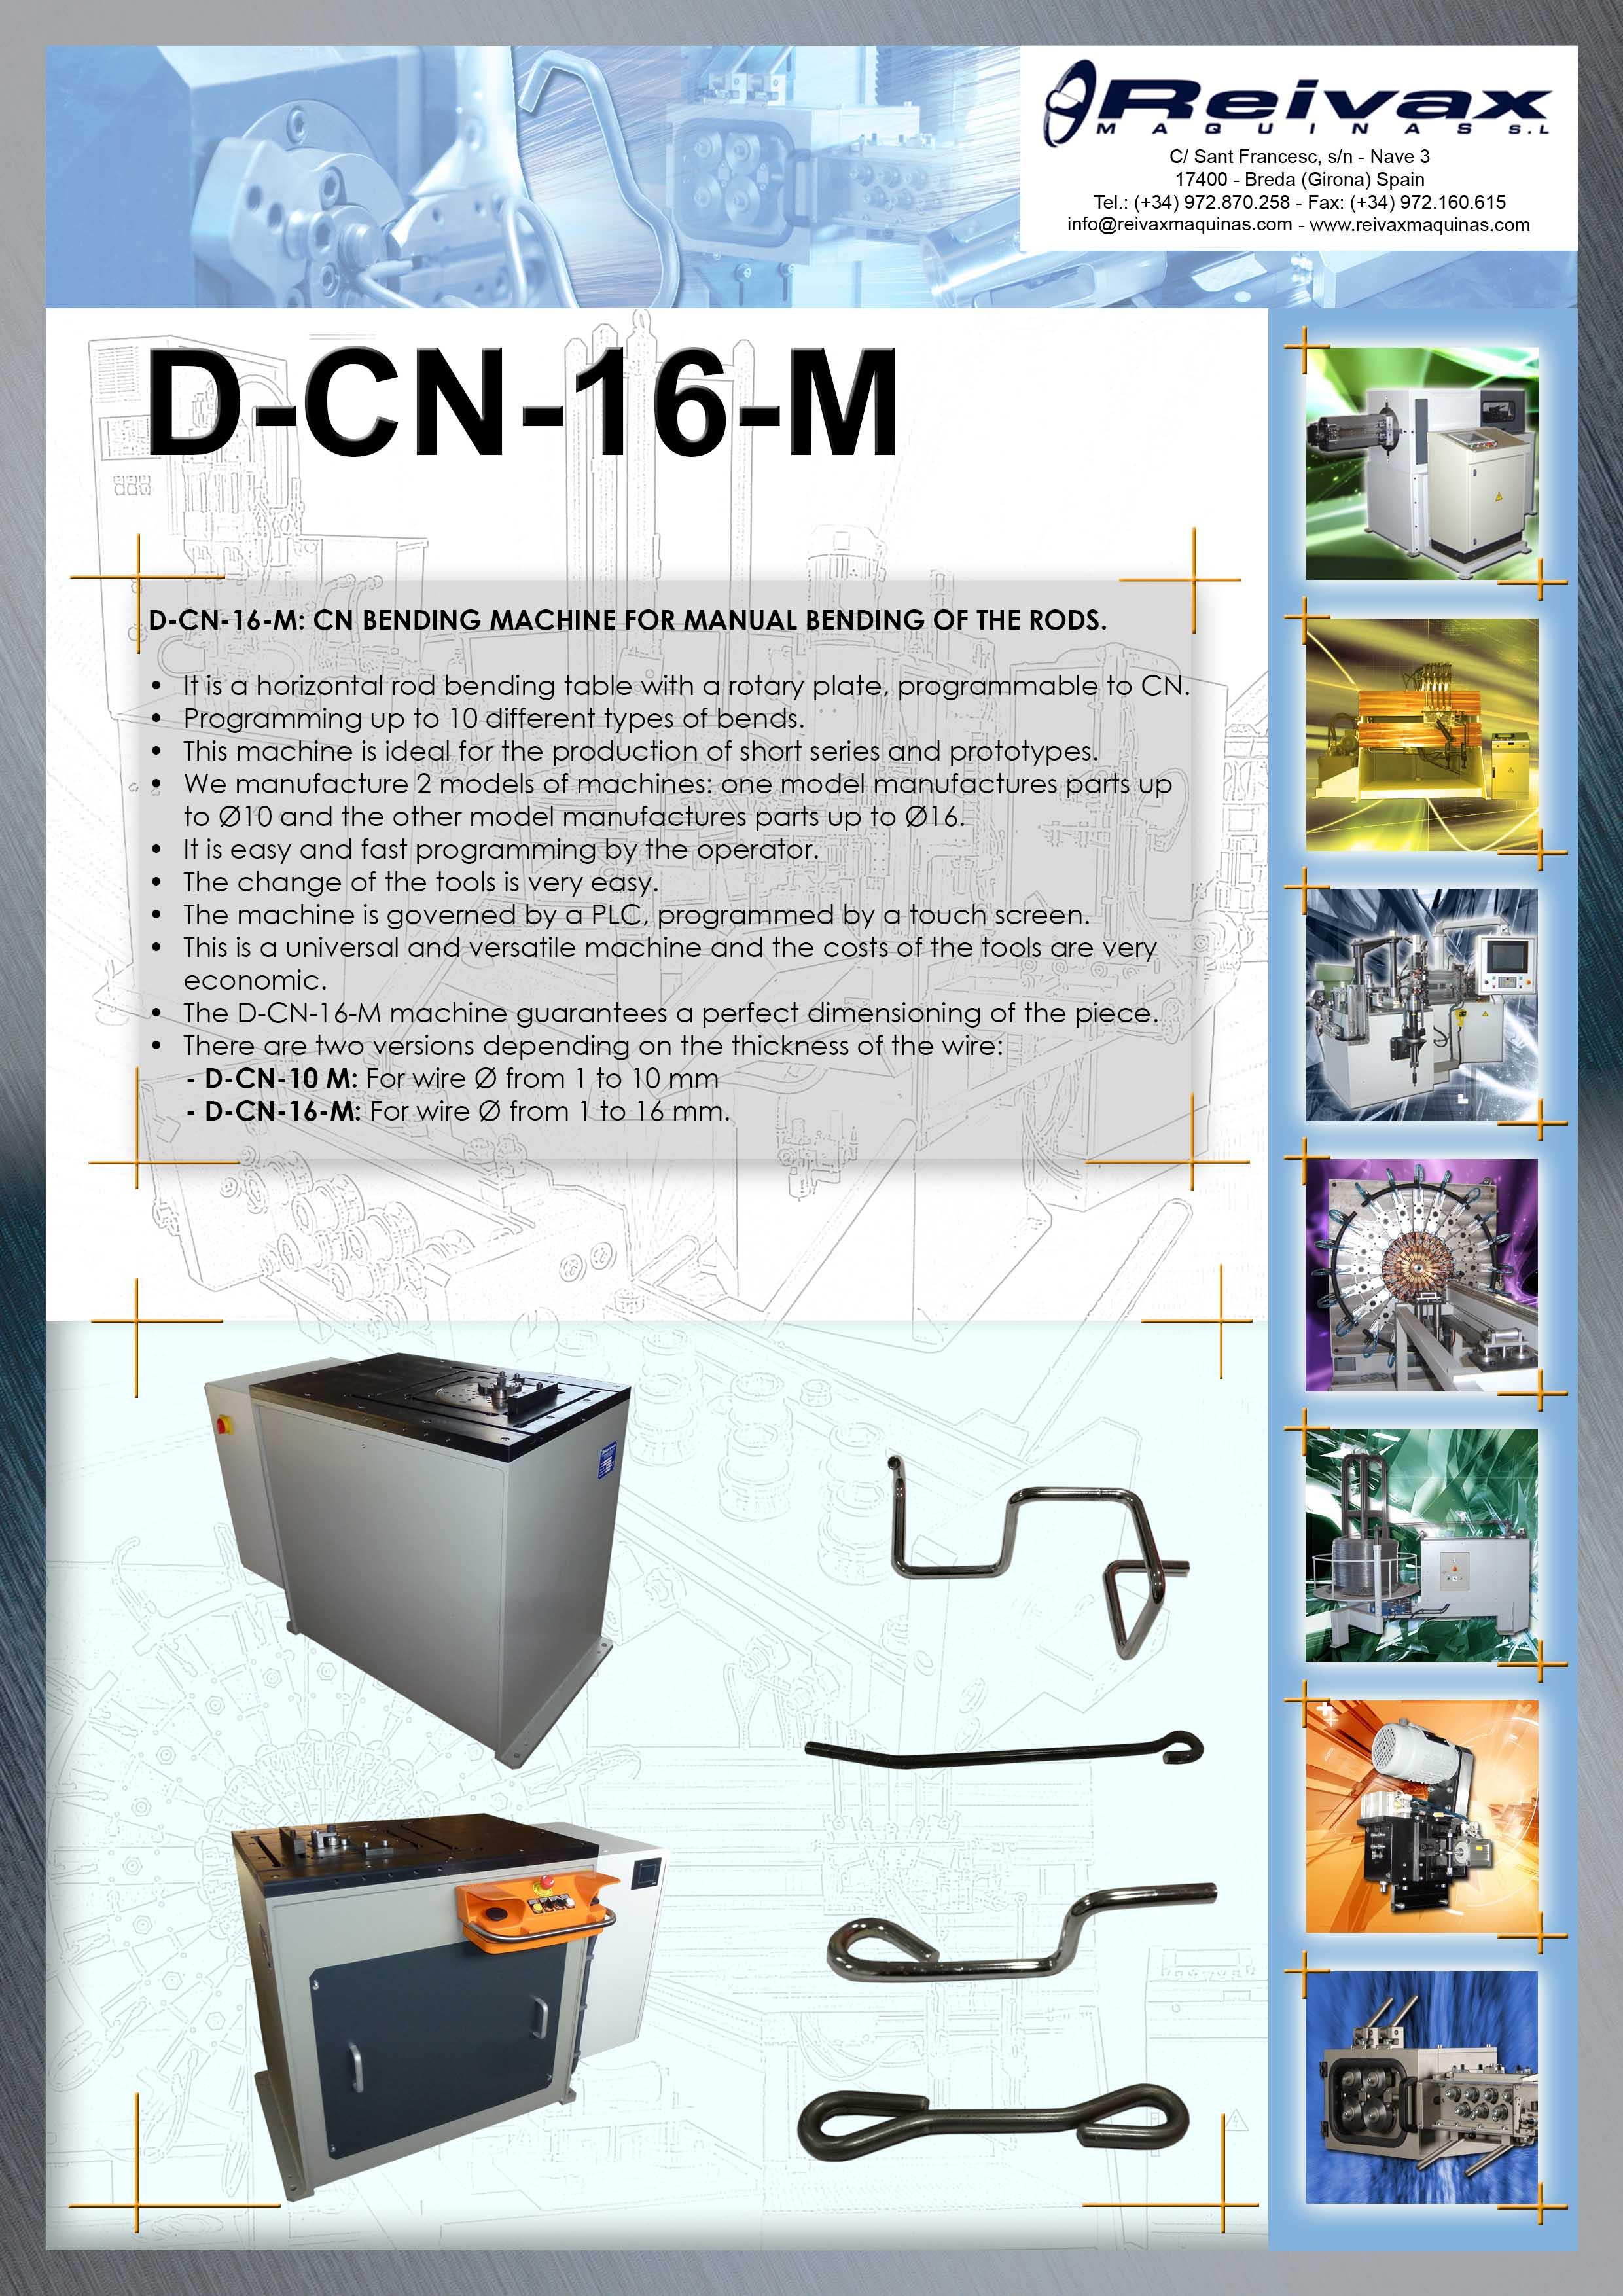 ReivaxMaquinas: Technical Details D-CN-16-M